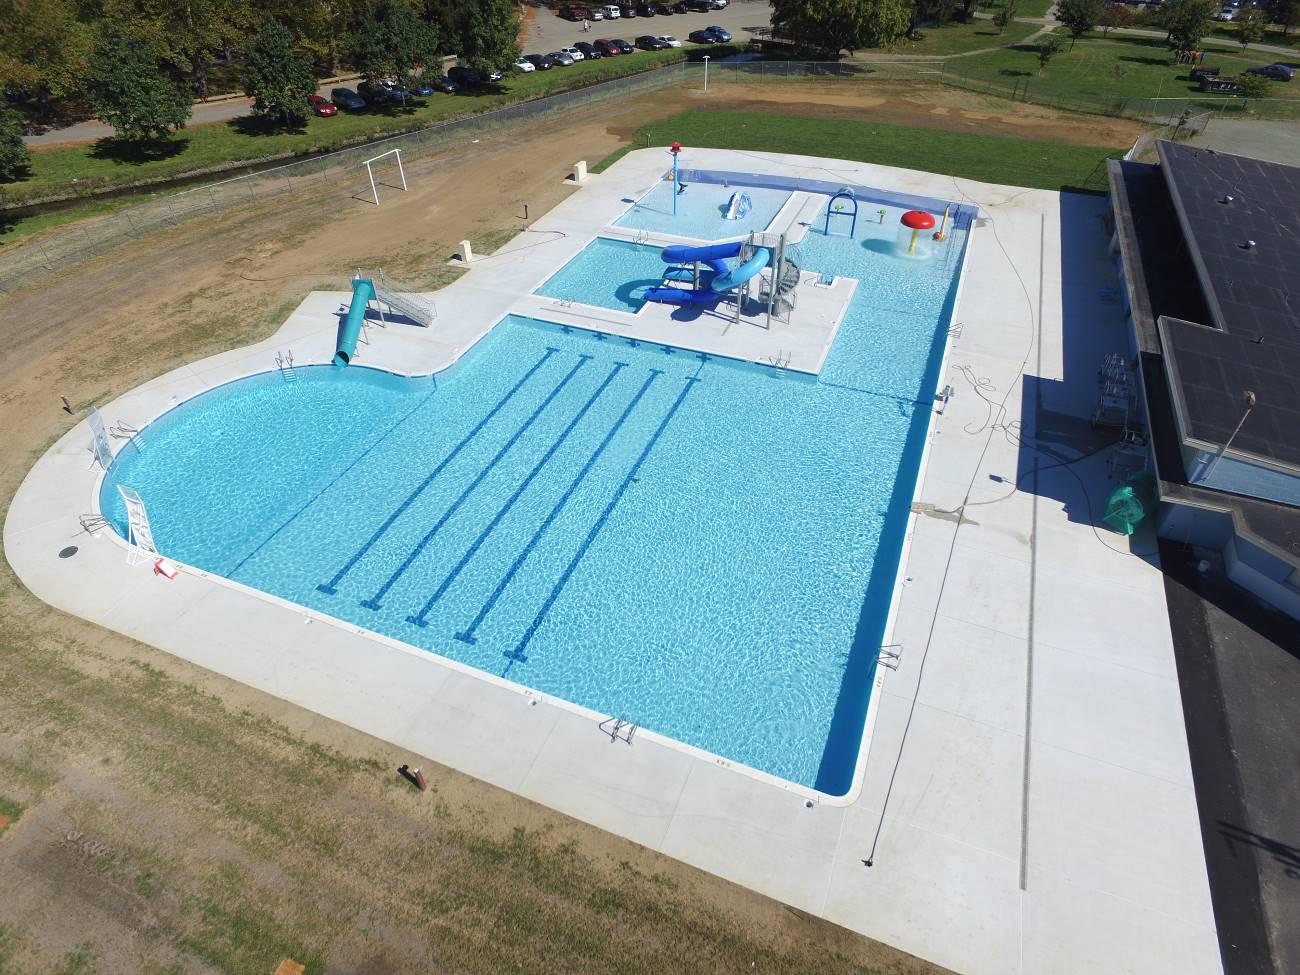 Midatlantic commercial aquatics cedar beach pool image - Cedar beach swimming pool allentown pa ...